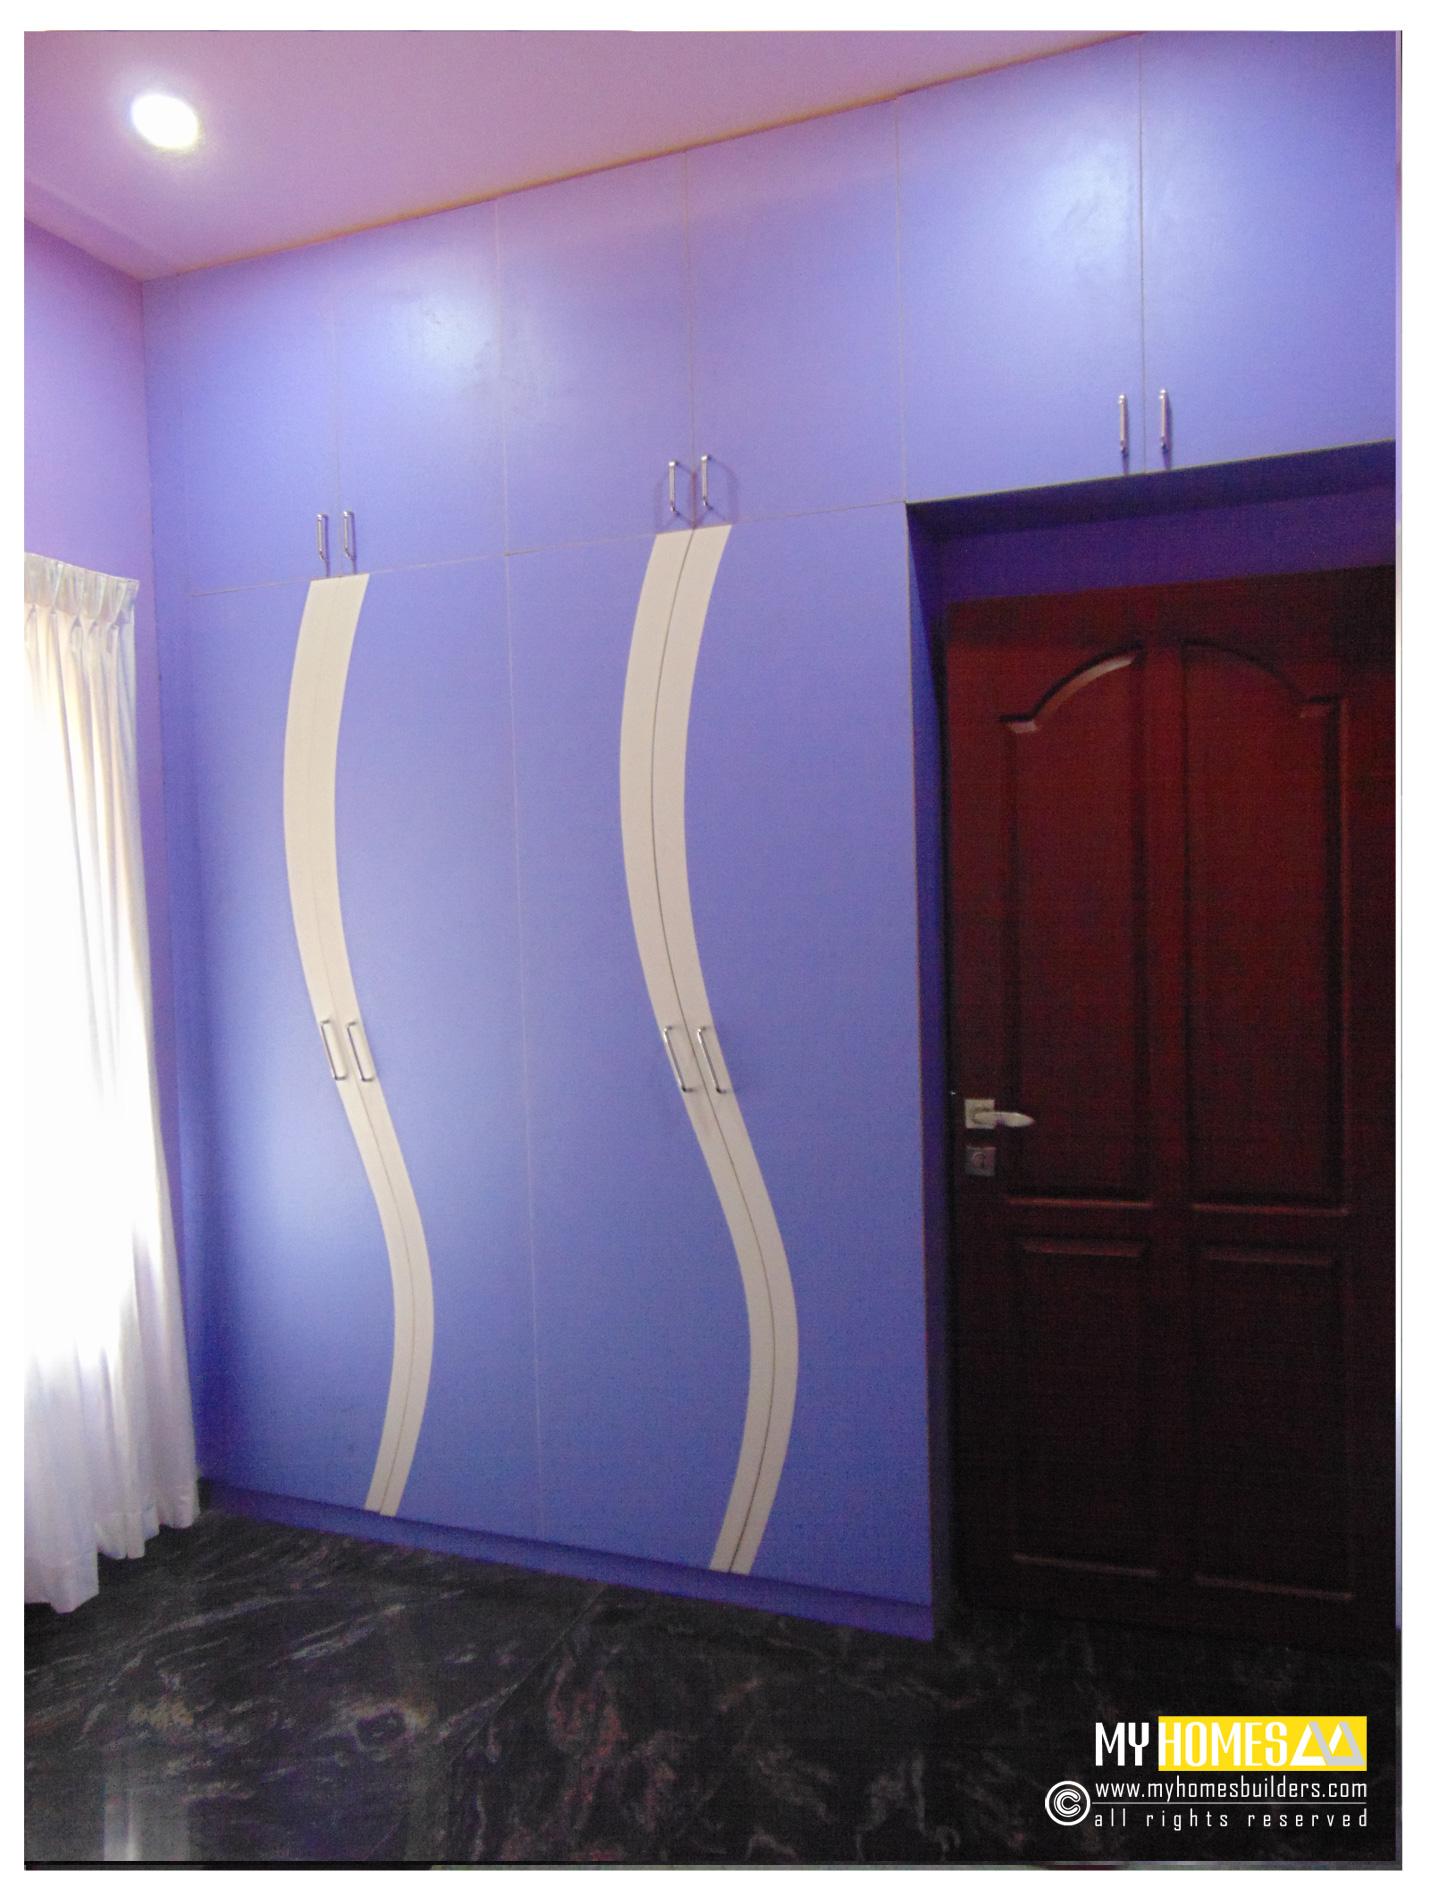 kida bed rooms design, kerala hmes kids bedroom designs, kids bedroom interior design in kerala